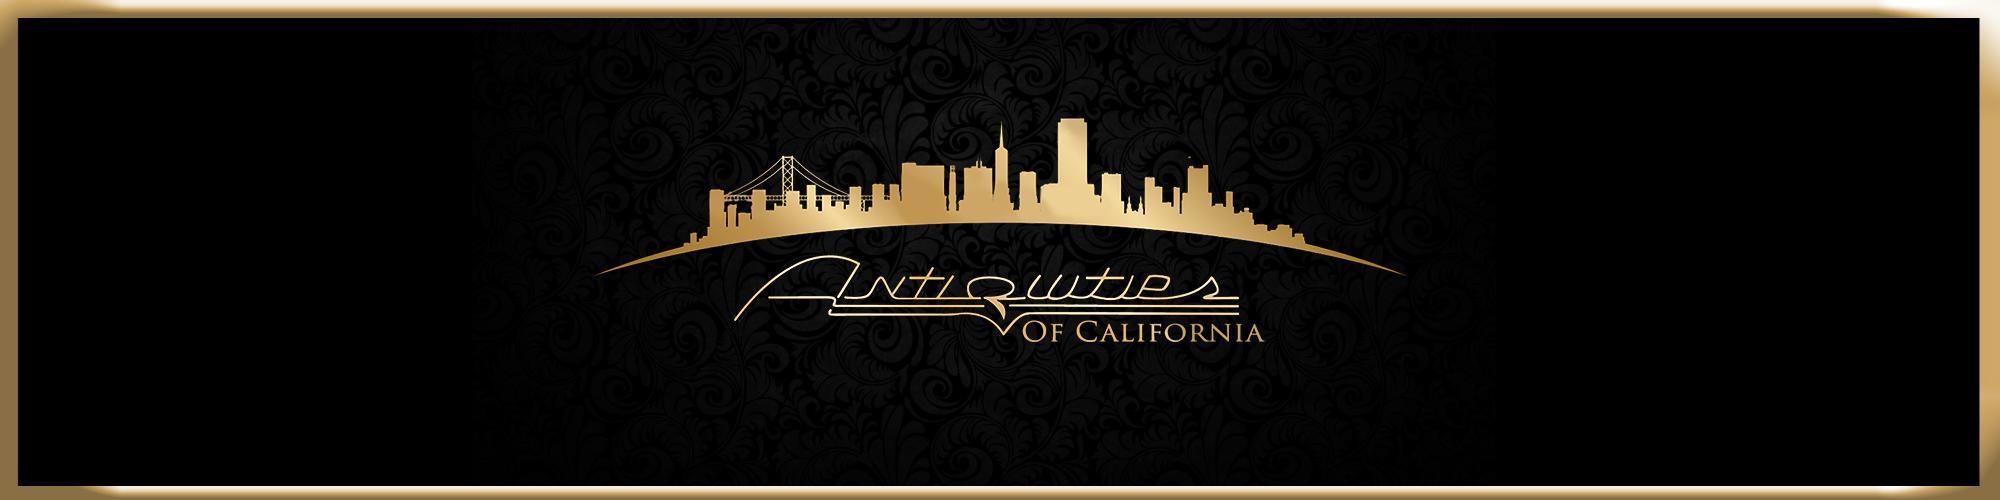 Antiquities of California  banner 1